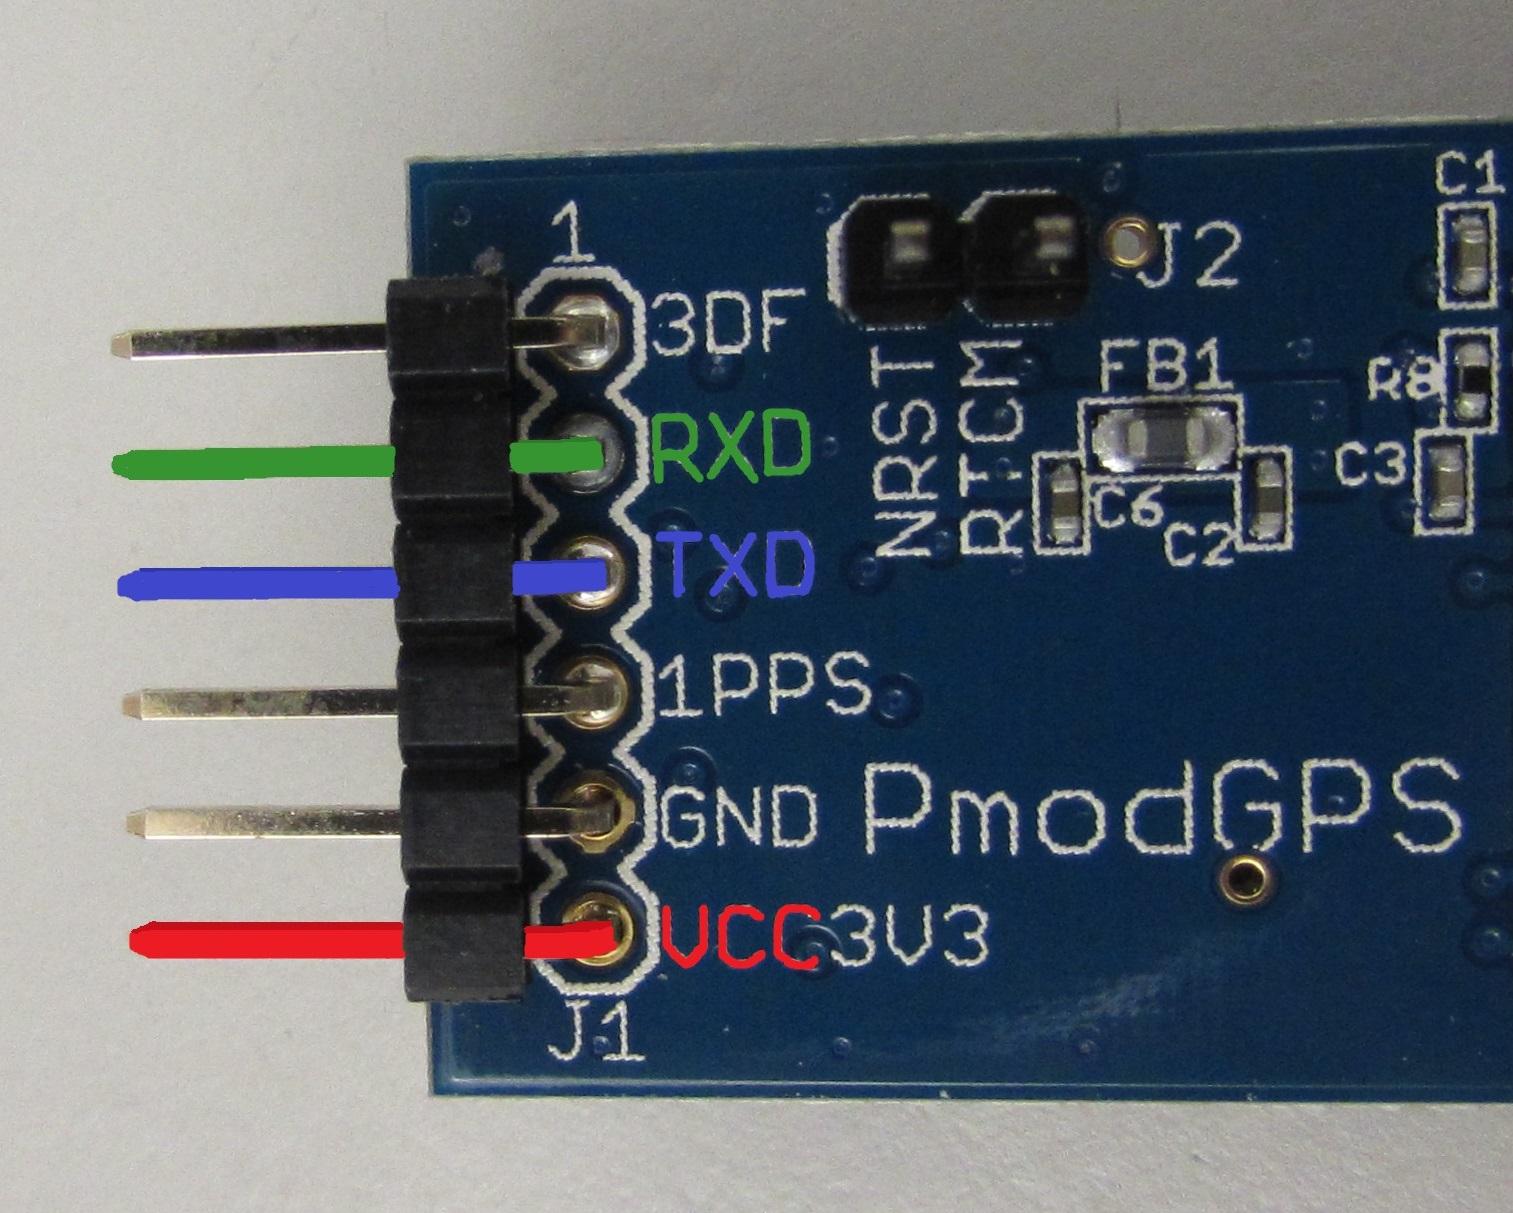 Digilent's 2 wire (receive and transmit) UART Pmod GPS